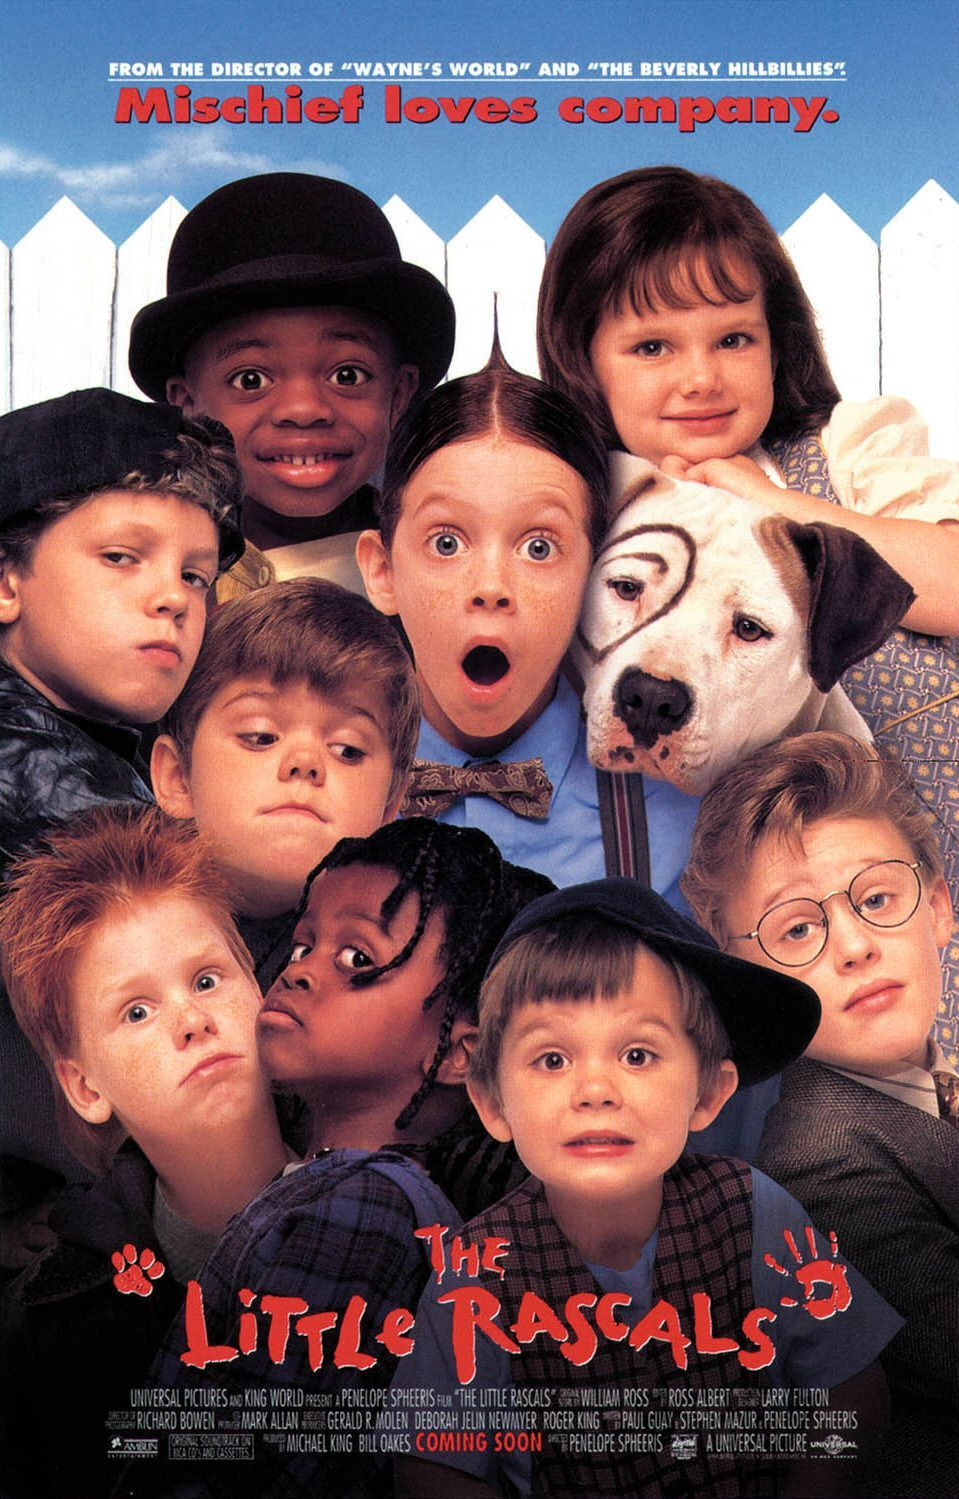 The Little Rascals, 1994